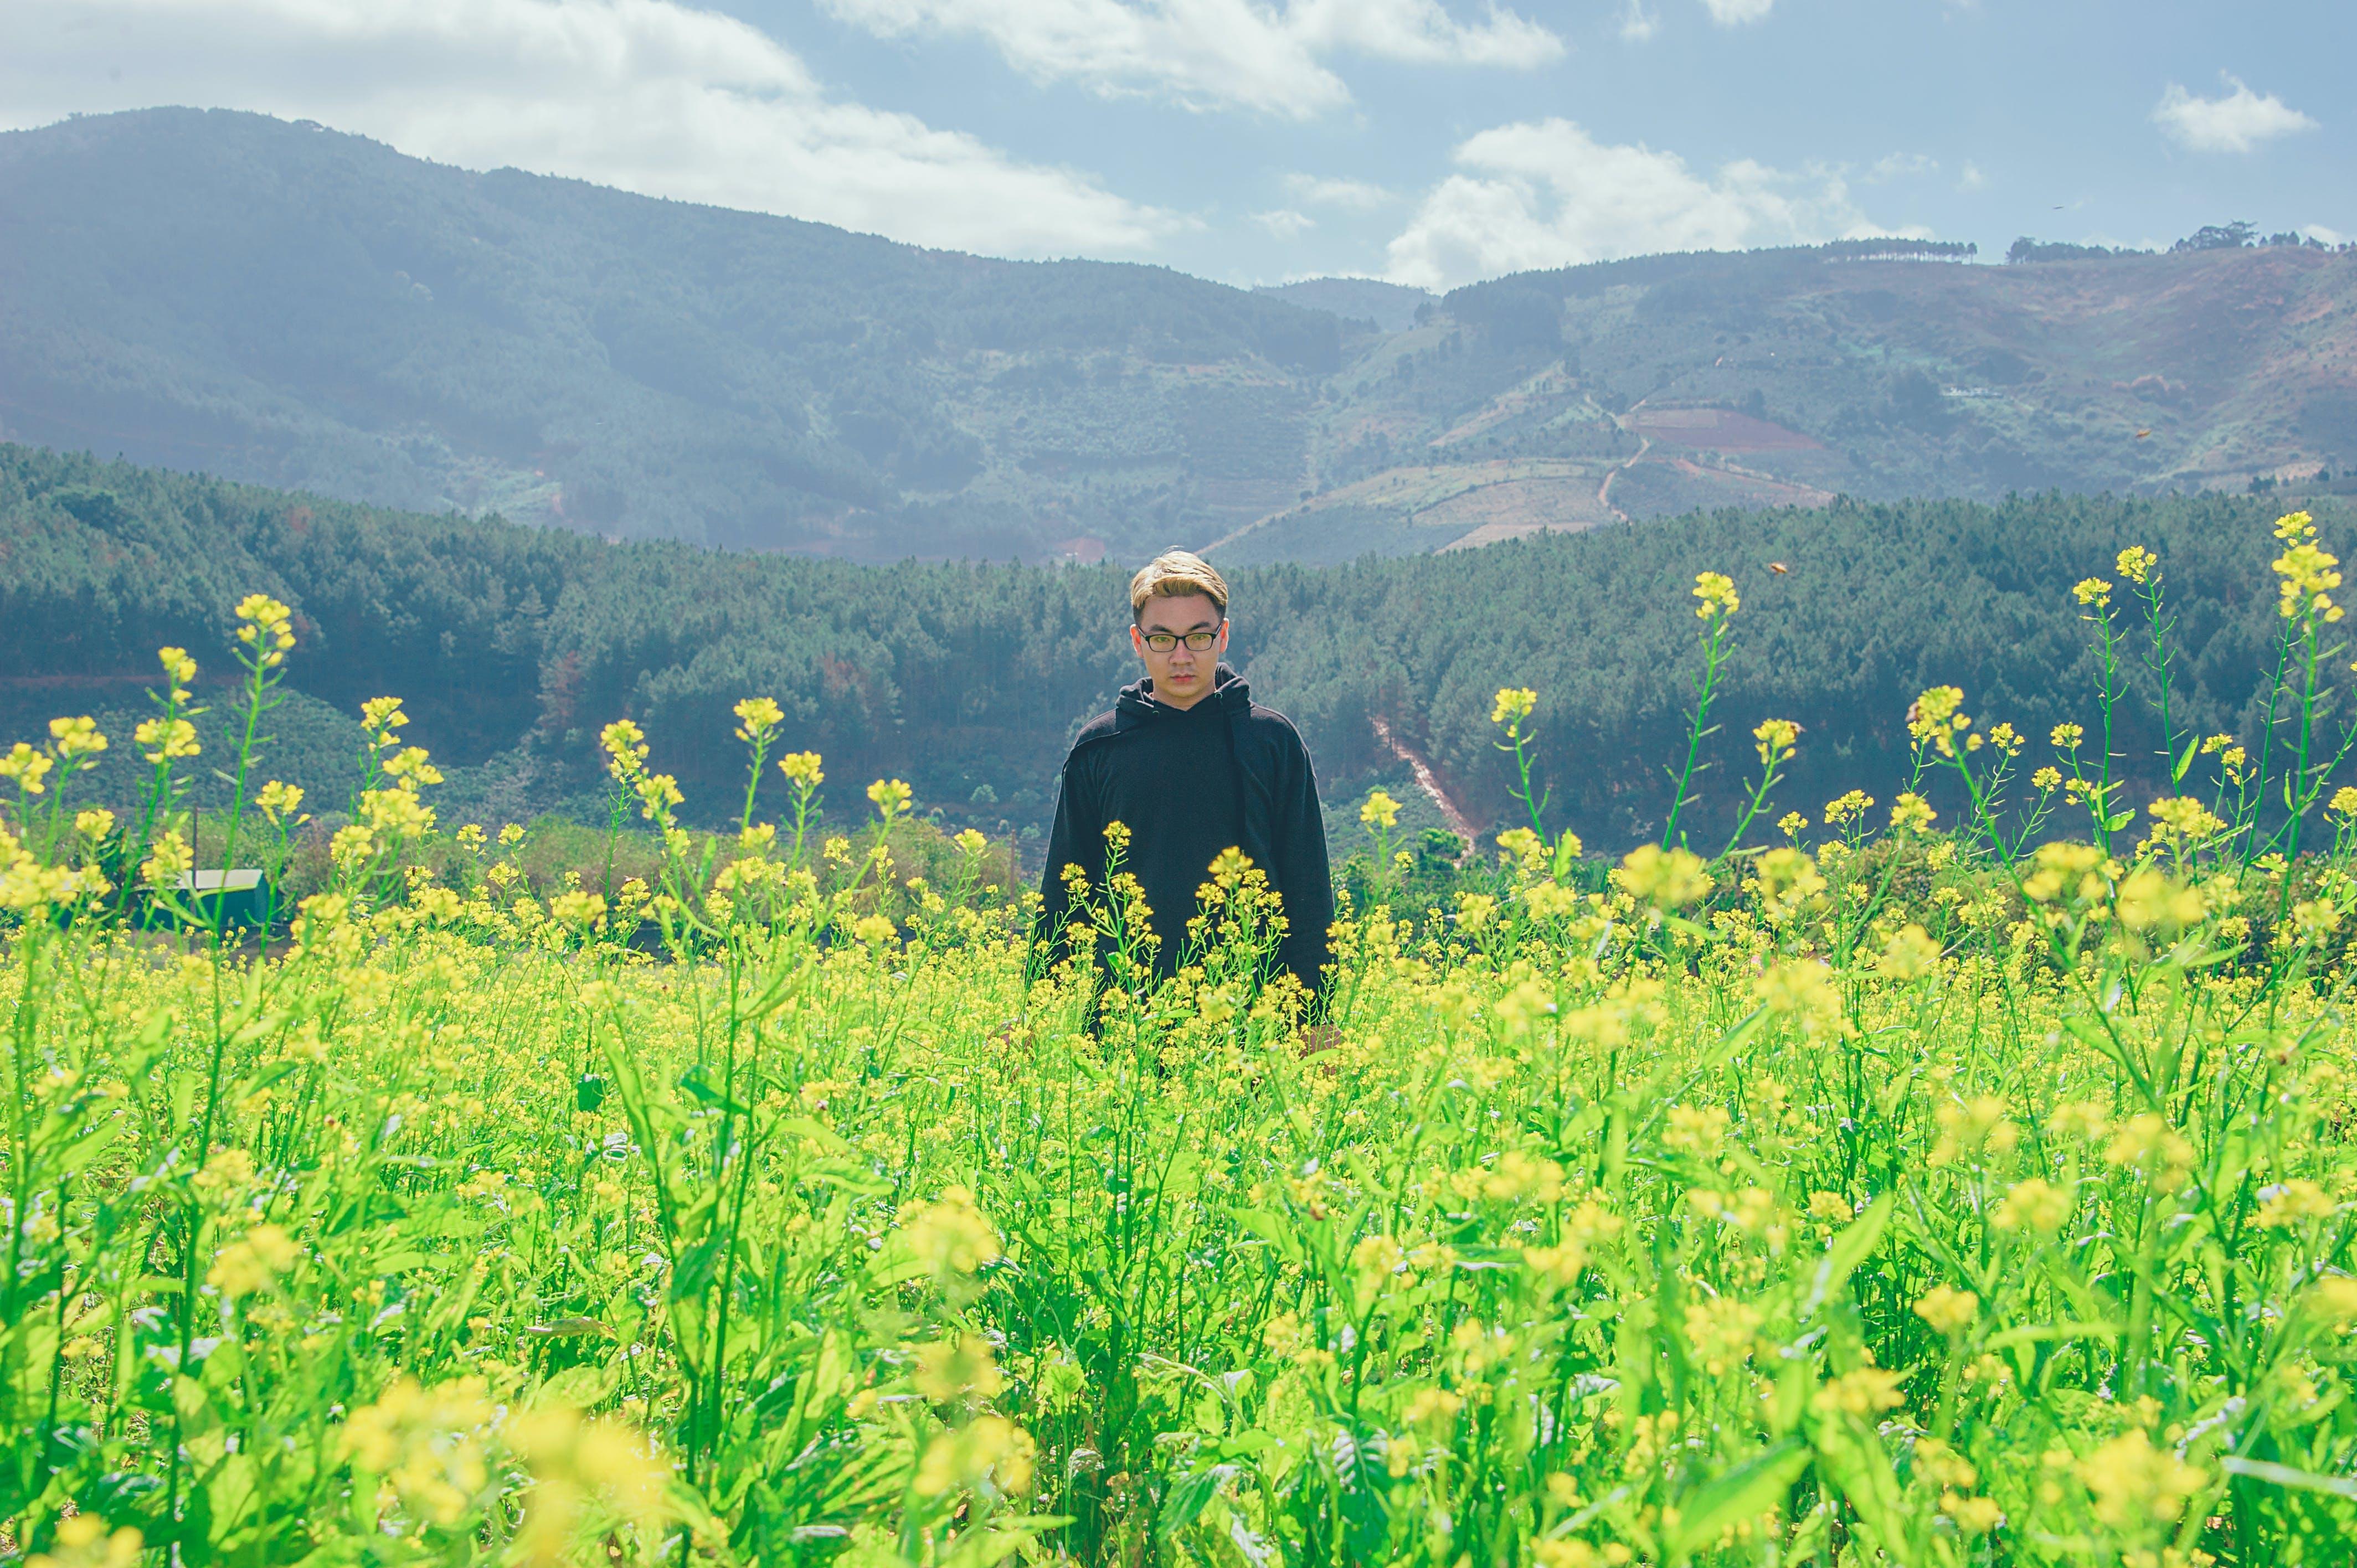 Fotos de stock gratuitas de bonito, campo, campo de flores, campos de cultivo